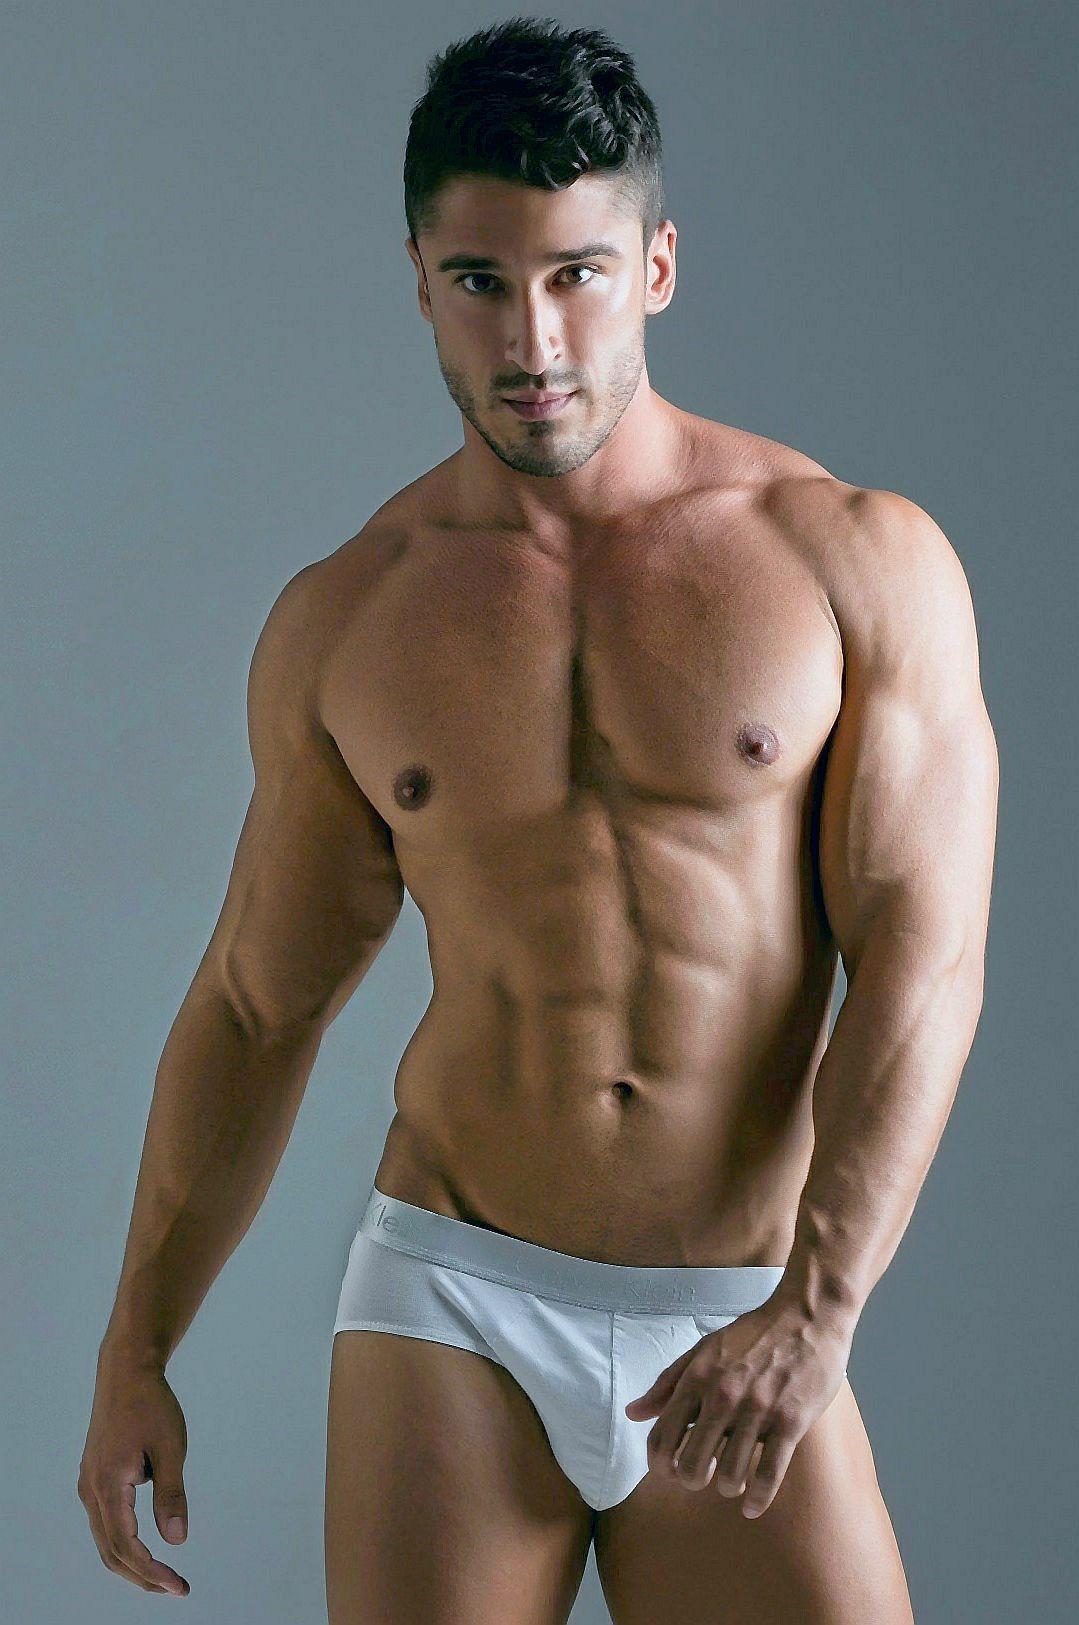 Fan favorite and Brazilian bodybuilding champ Samuel Vieira